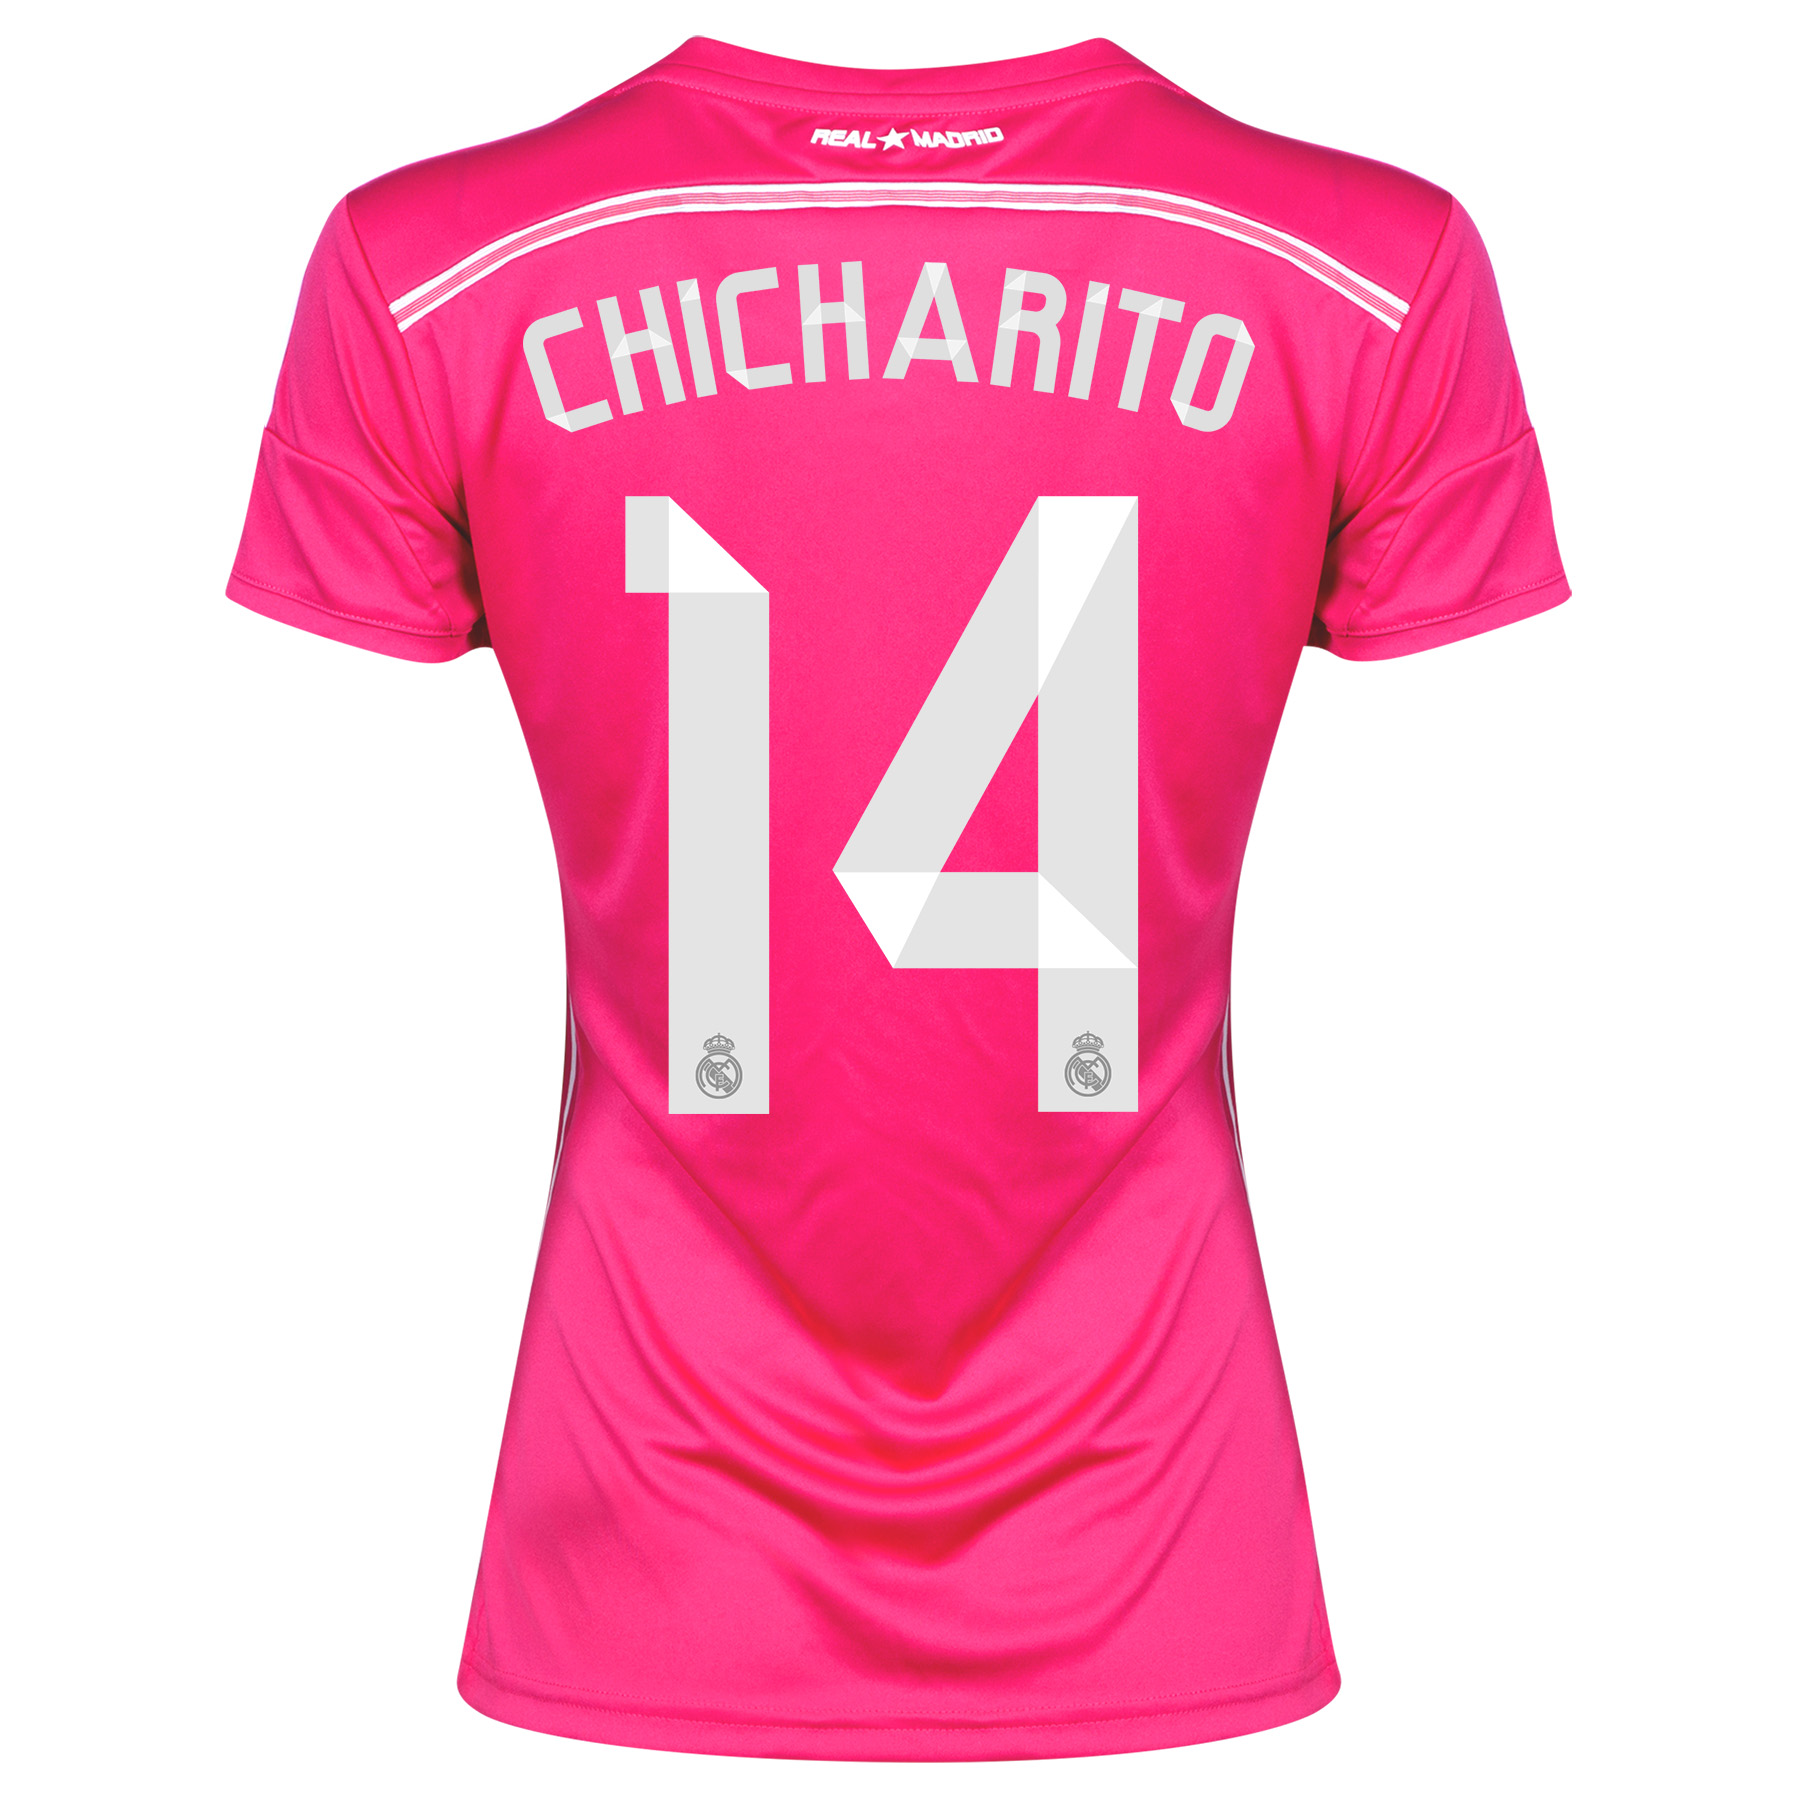 Real Madrid Away Shirt 2014/15 Womens with Chicharito 14 printing